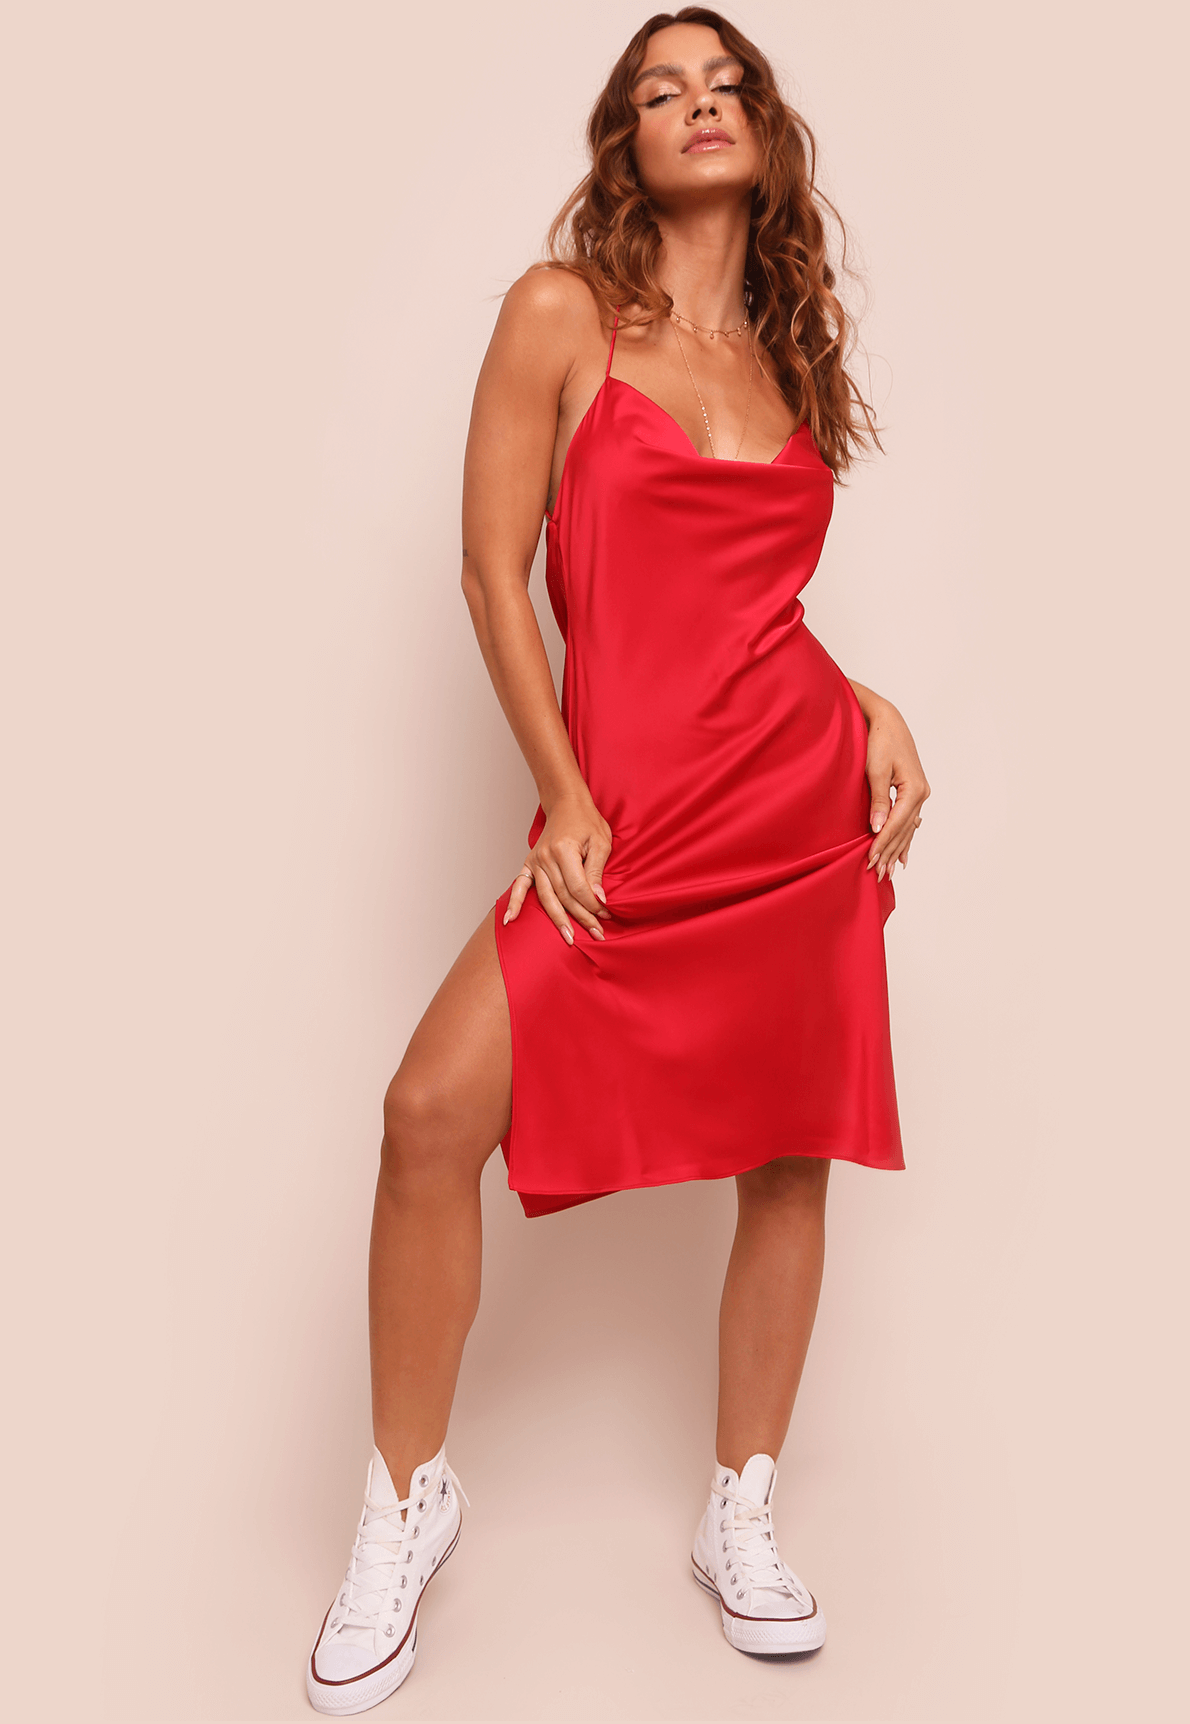 32915-vestido-midi-sleep-dress-vermelho-matilda-mundo-lolita-01